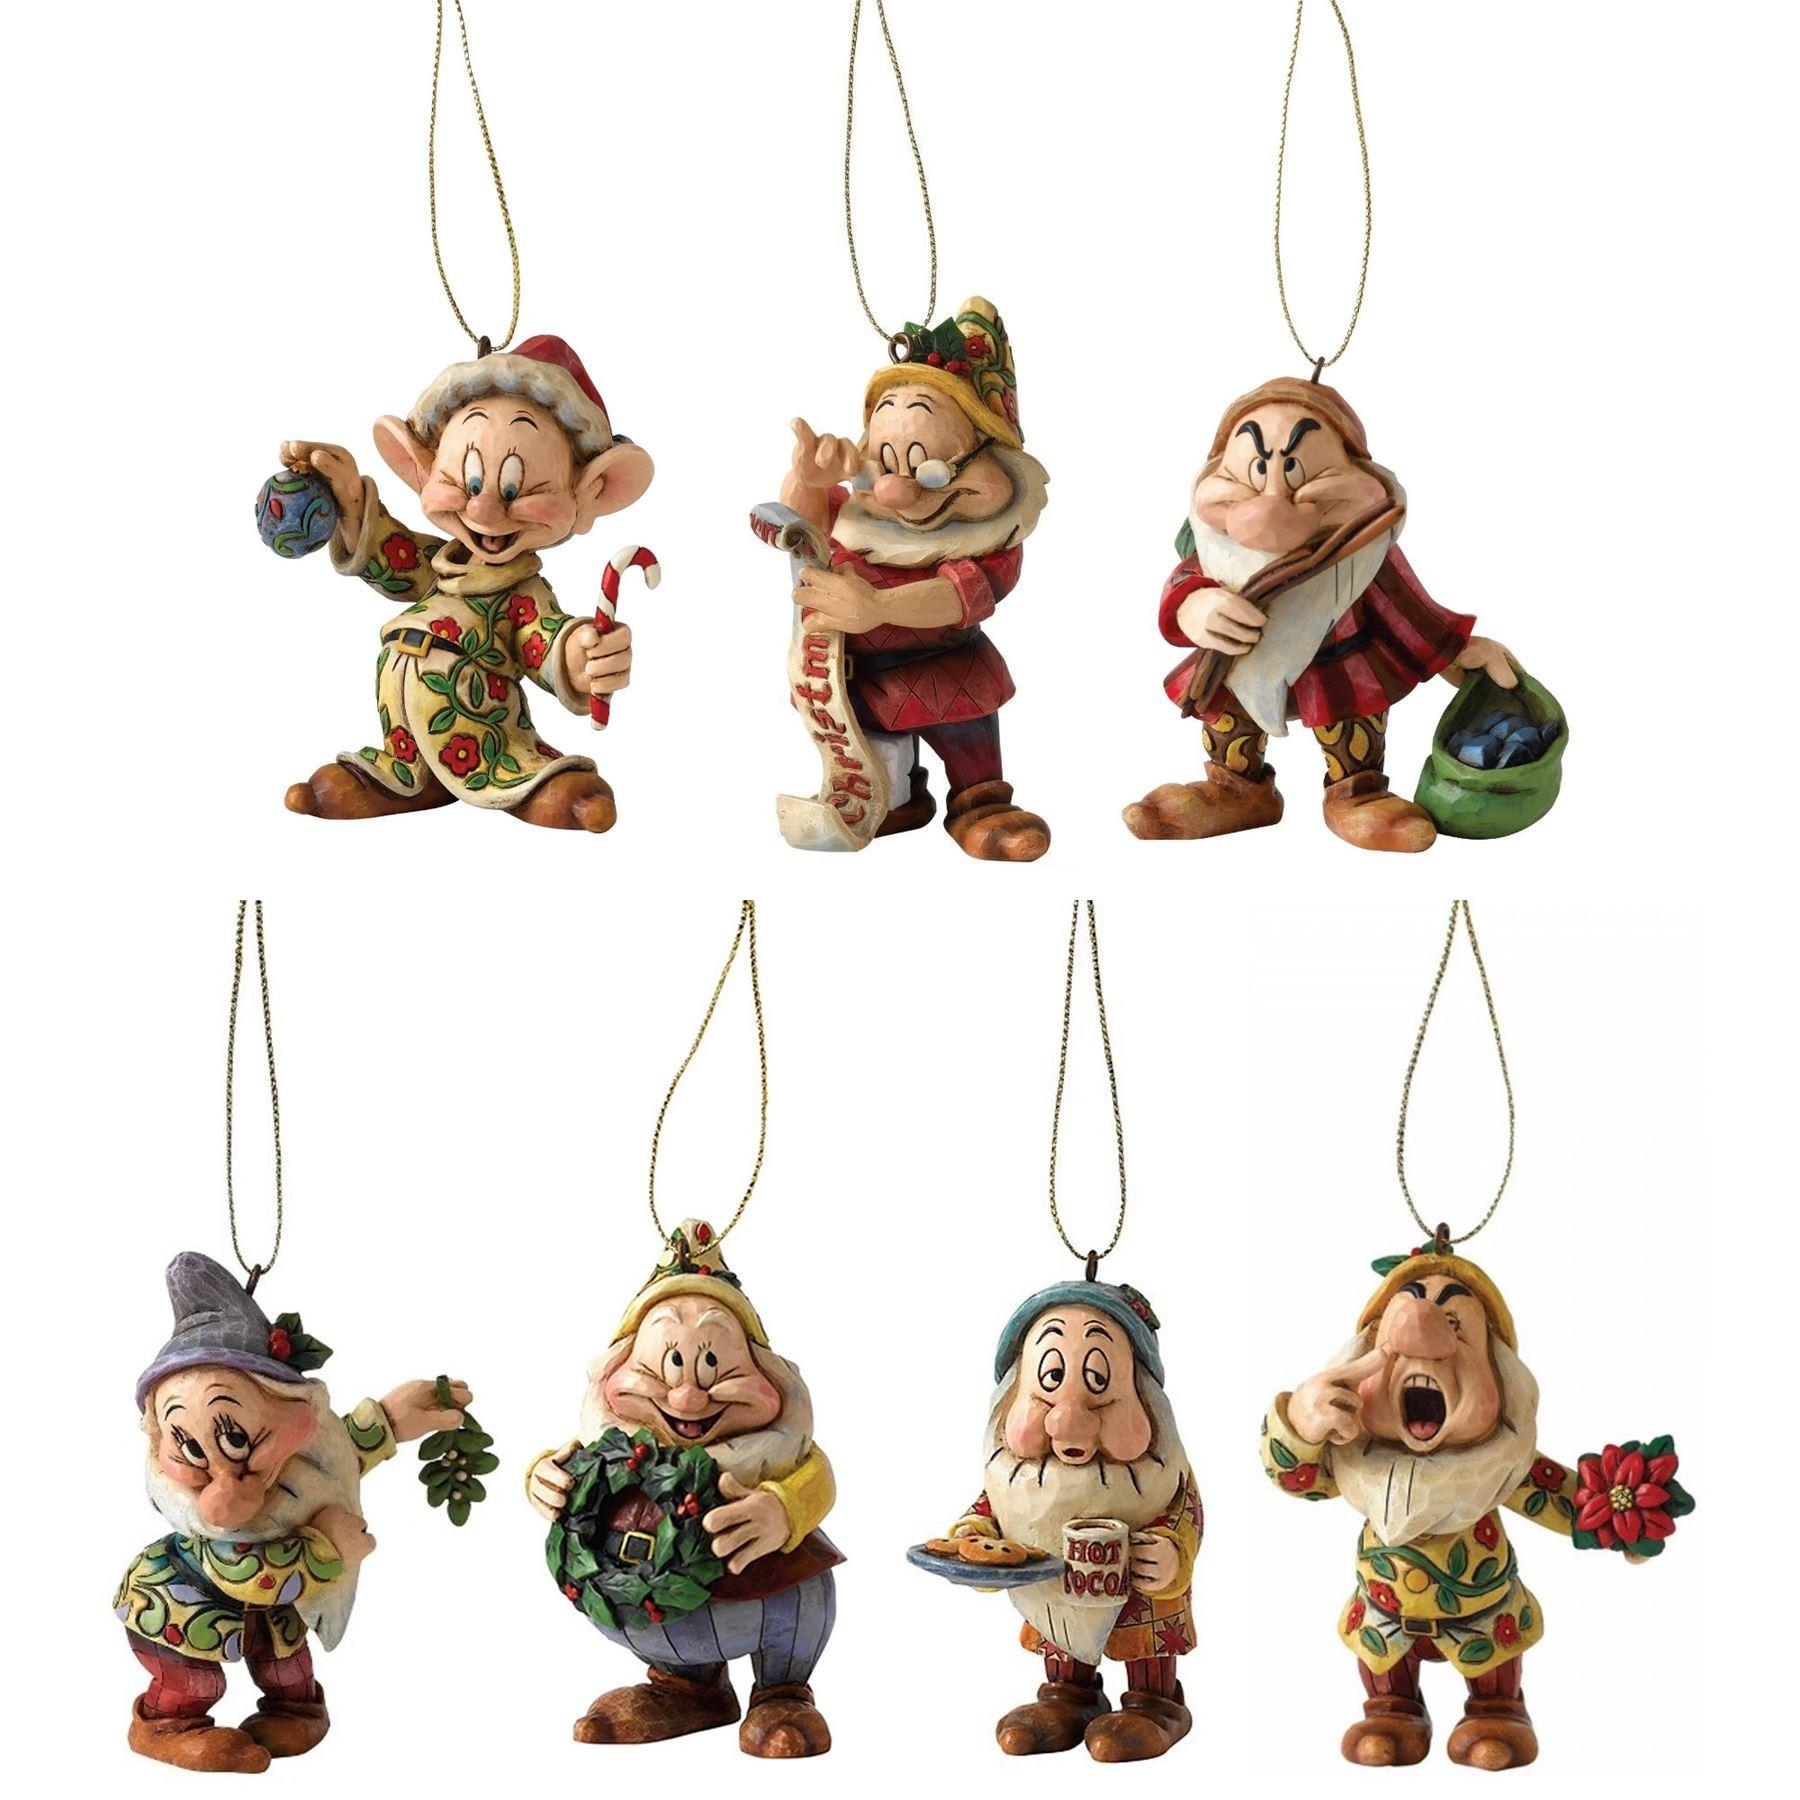 Disney WEIHNACHTEN TRADITIONS Hanging Ornament Snowwhite Shore Figur A9046